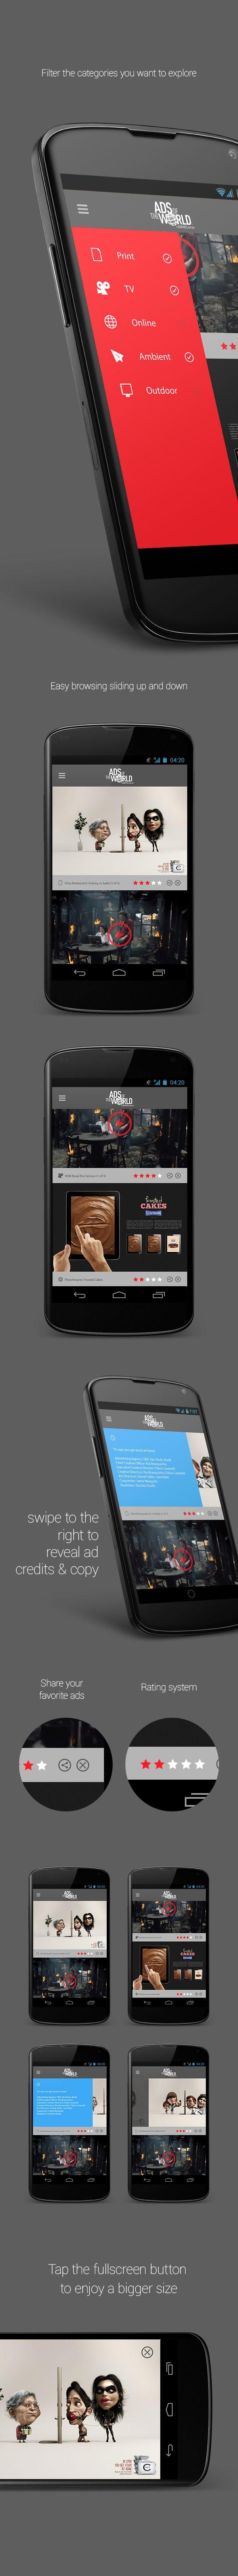 Ads of the world app by Sherif Adel, via Behance